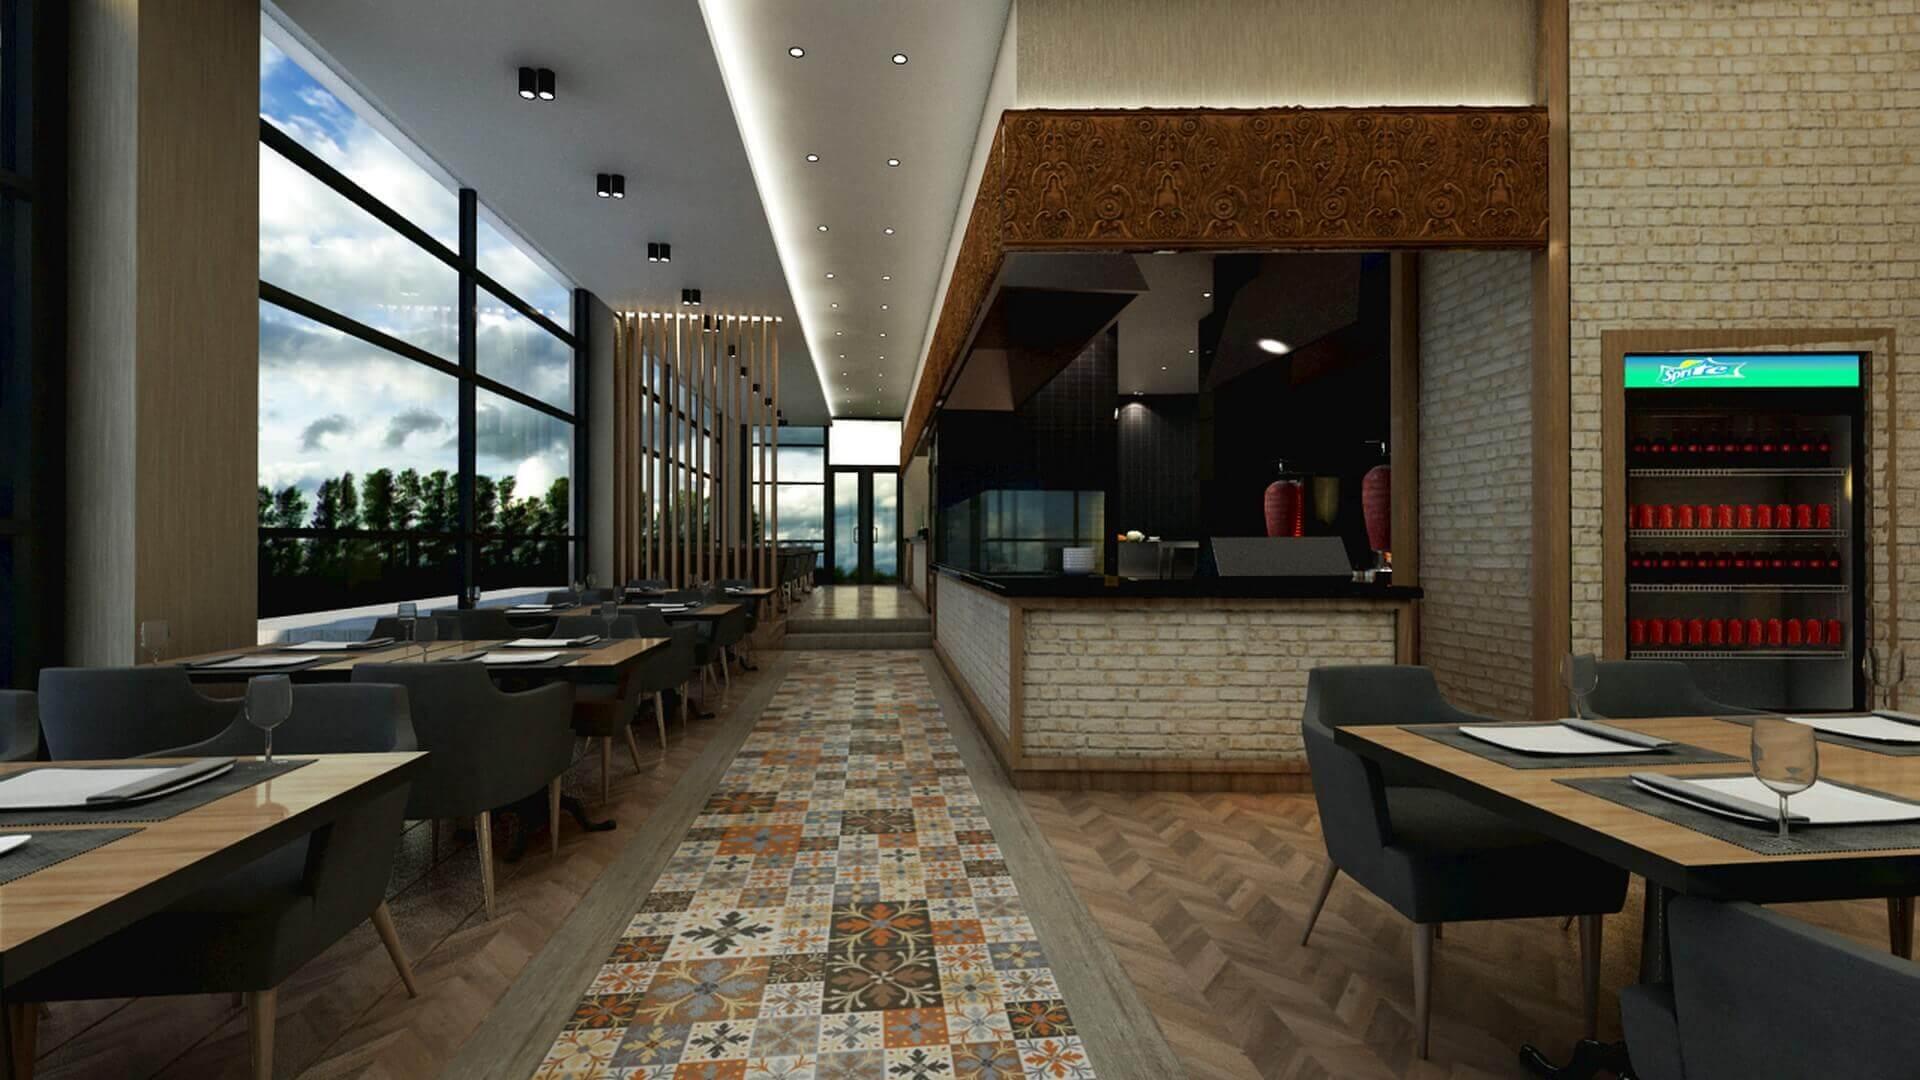 restoran tasarımı 2065 Otonomi Restoran Restoranlar